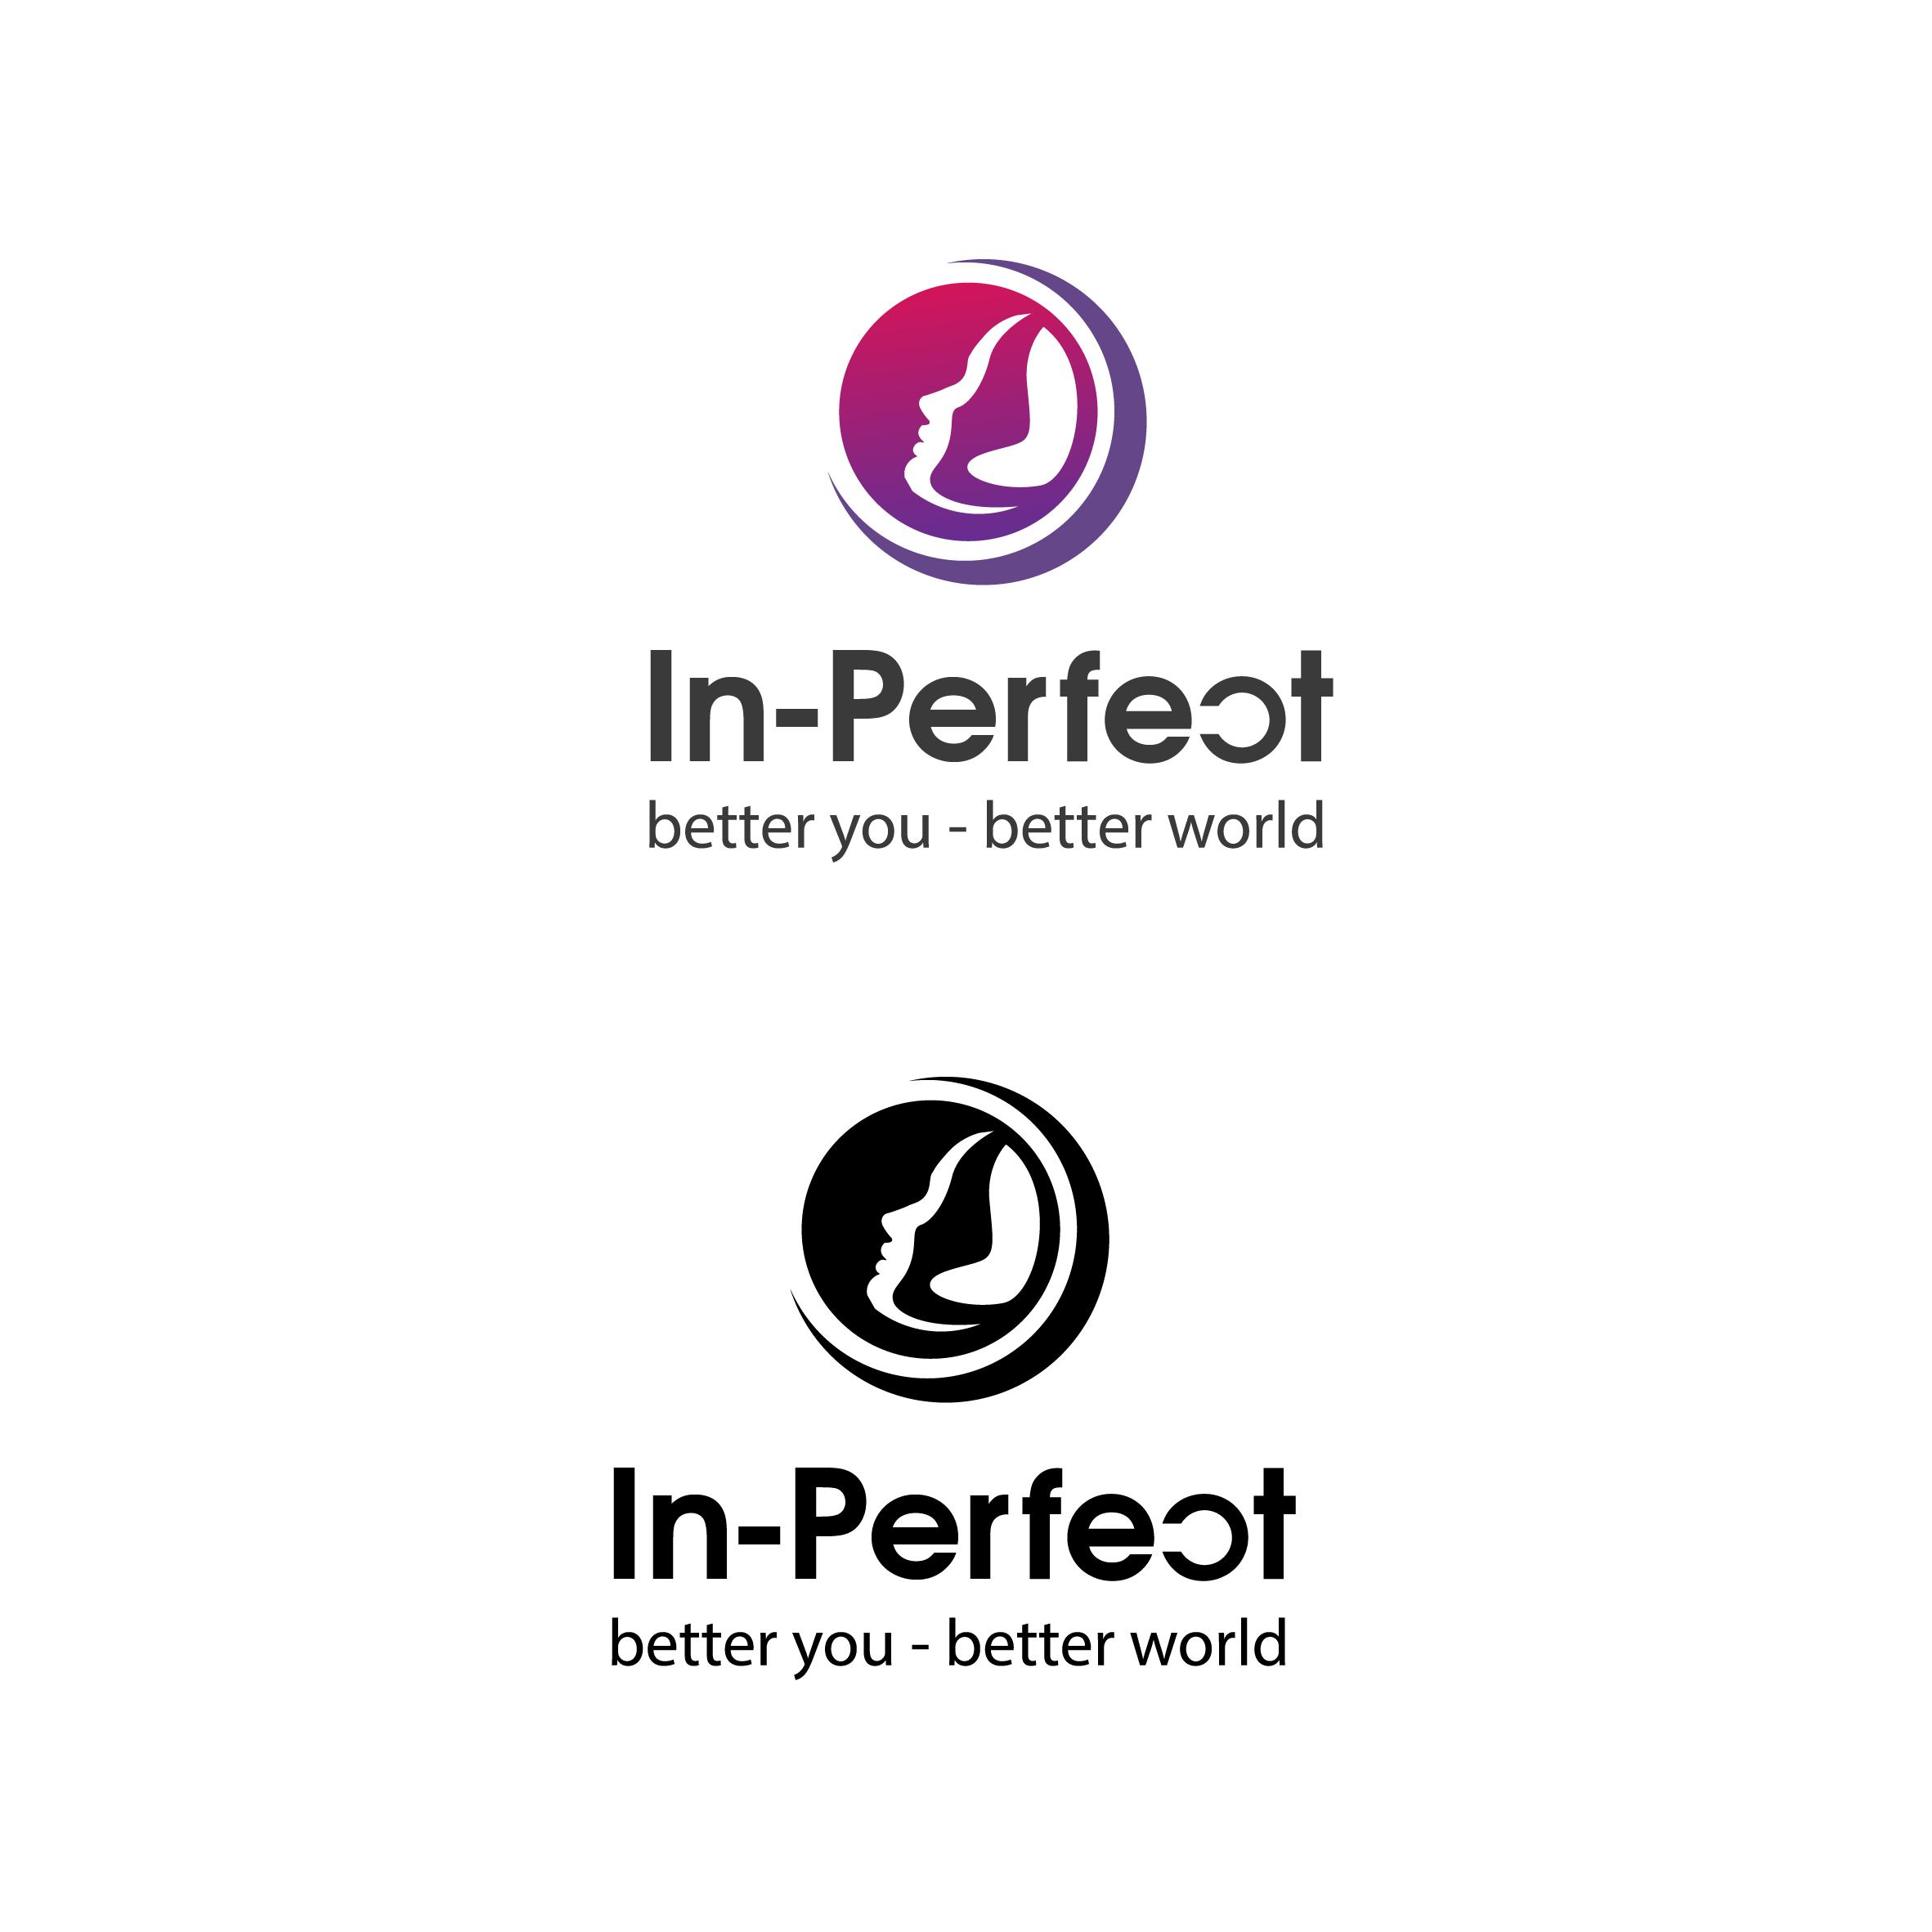 Необходимо доработать логотип In-perfect фото f_0135f1ee5813d8c1.png